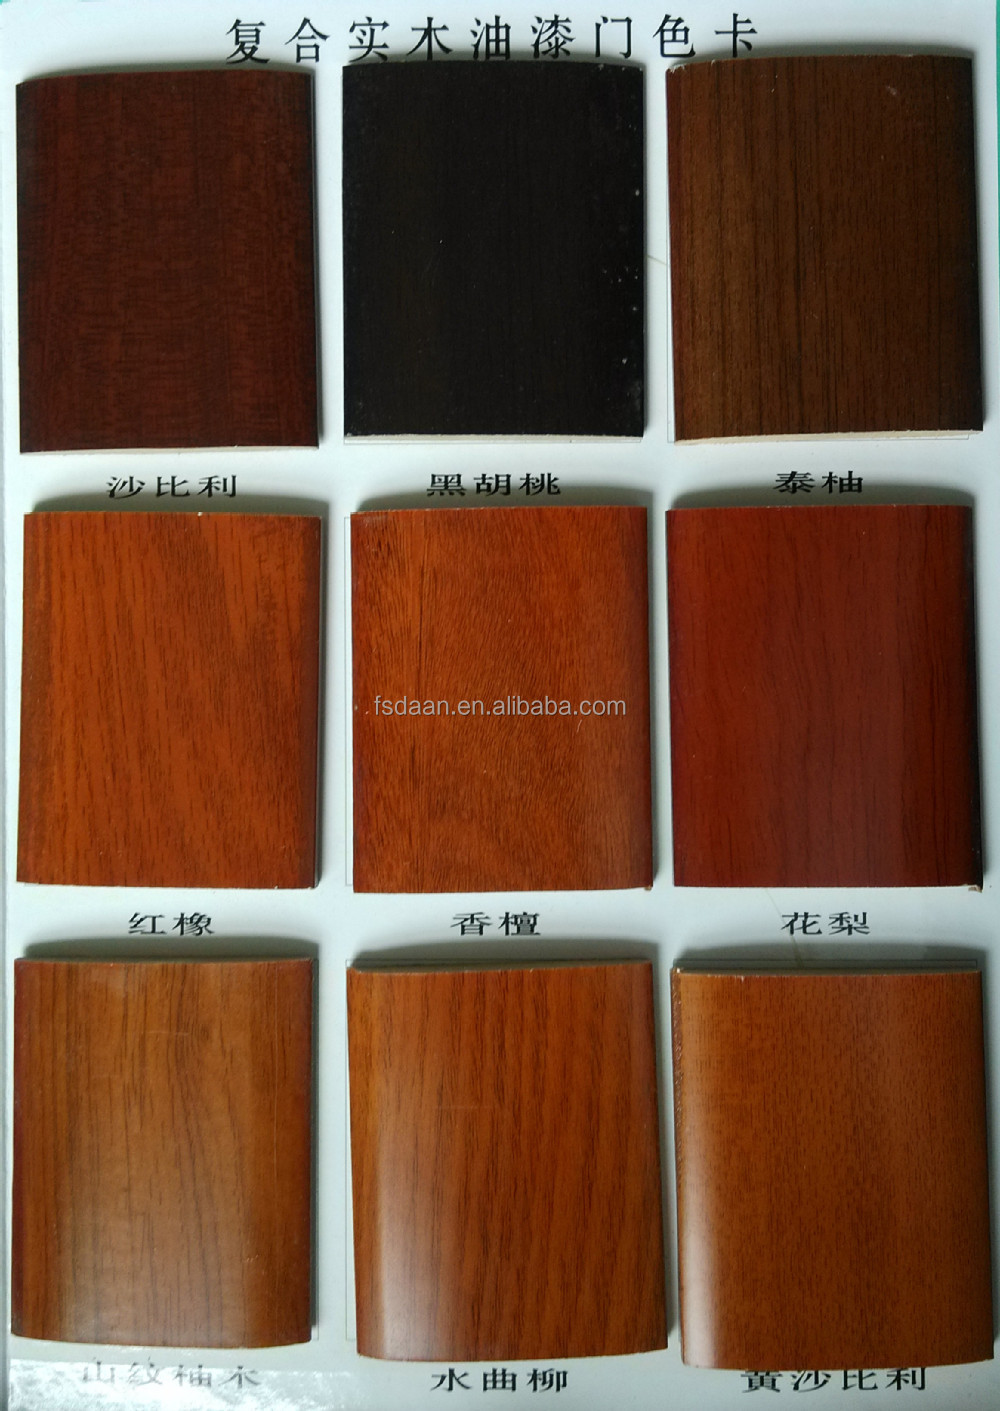 extraordinary brown polish on doors photos best image engine extraordinary brown polish on doors photos best image engine freezoka us